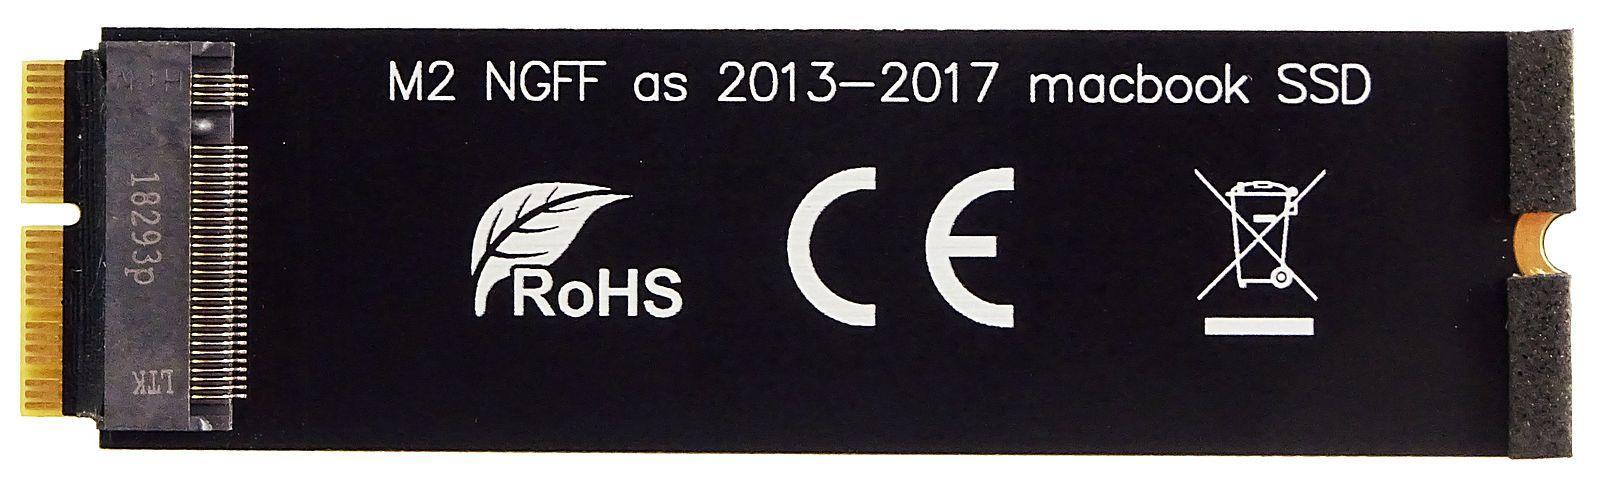 M.2 (NGFF) PCIe SSD als 2013-2017 MacBook-SSD